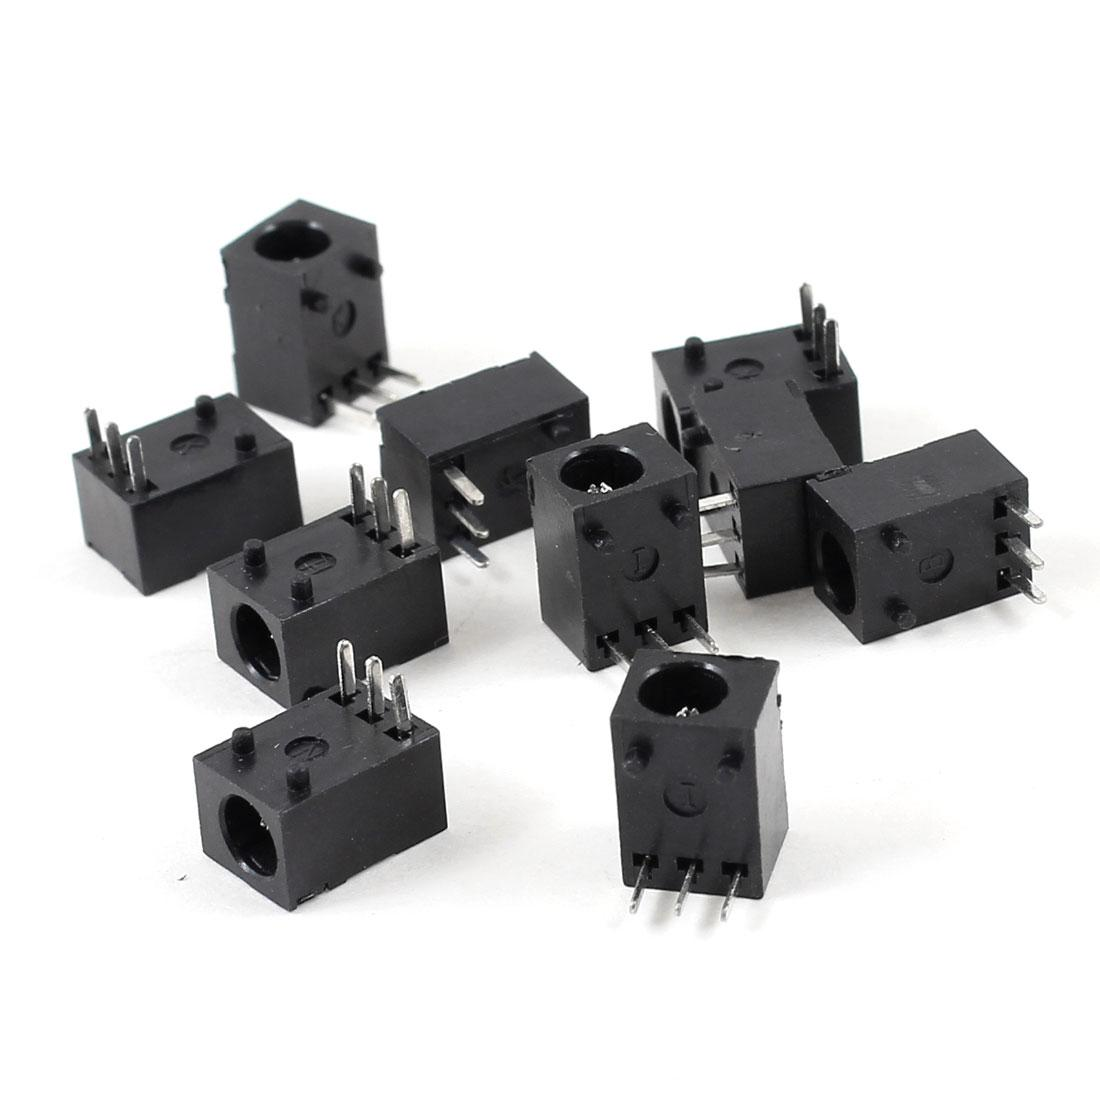 how to add more sockets in diablo 2